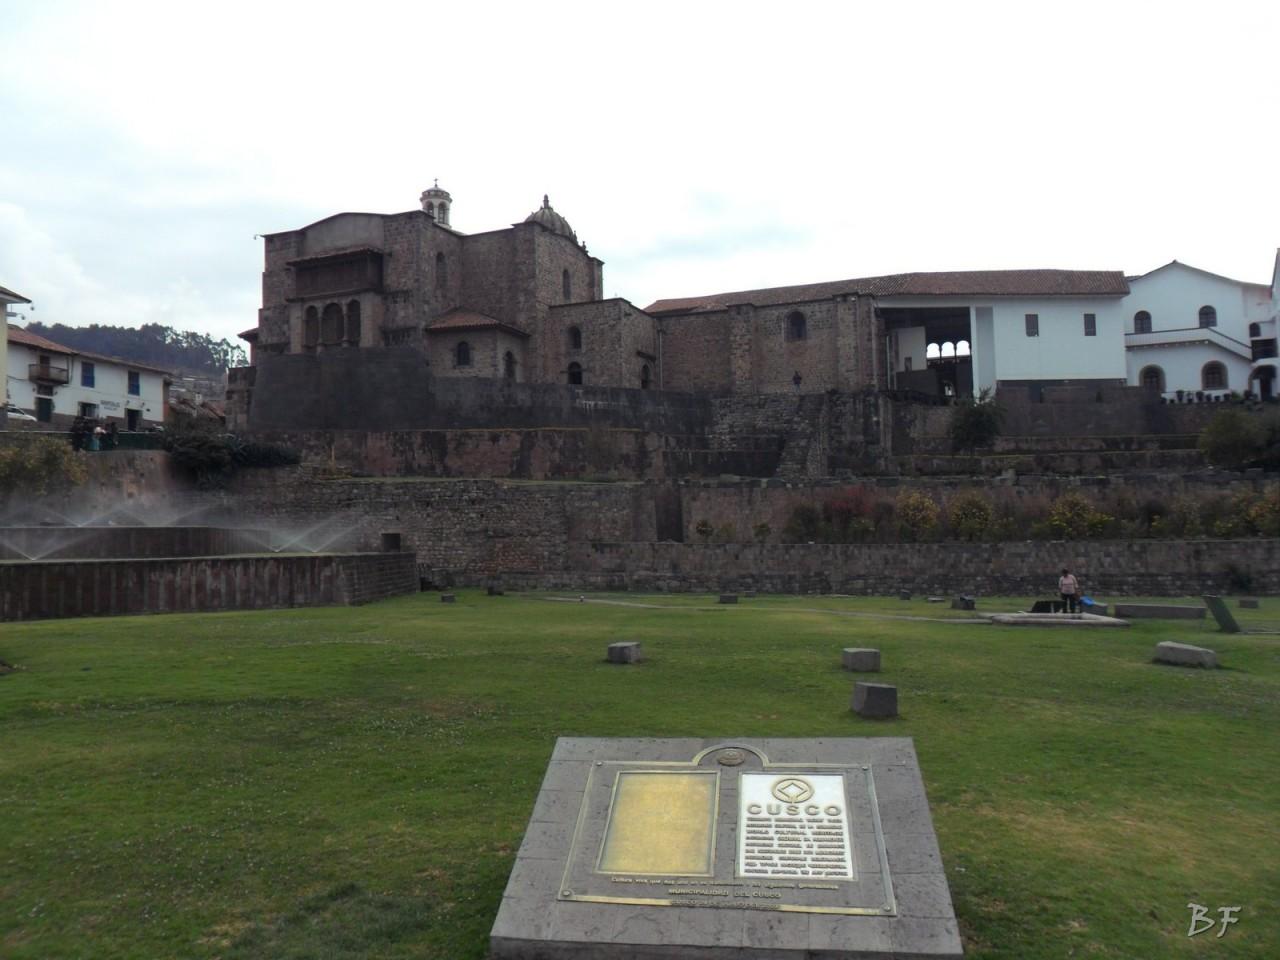 Mura-Poligonali-Megaliti-Tempio-Coricancha-Cusco-Perù-64